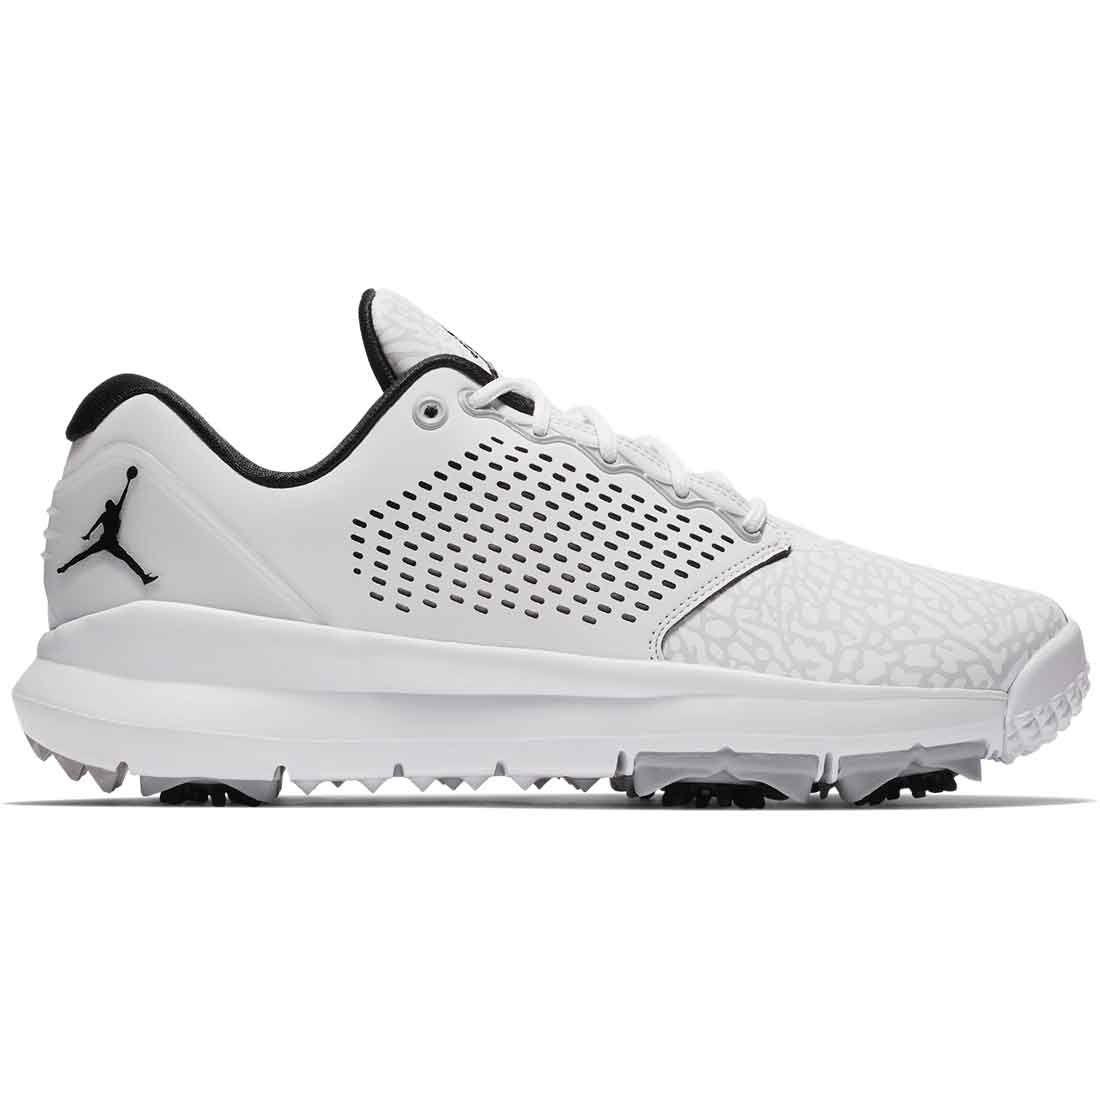 Buy Nike Jordan Trainer ST G Golf Shoes